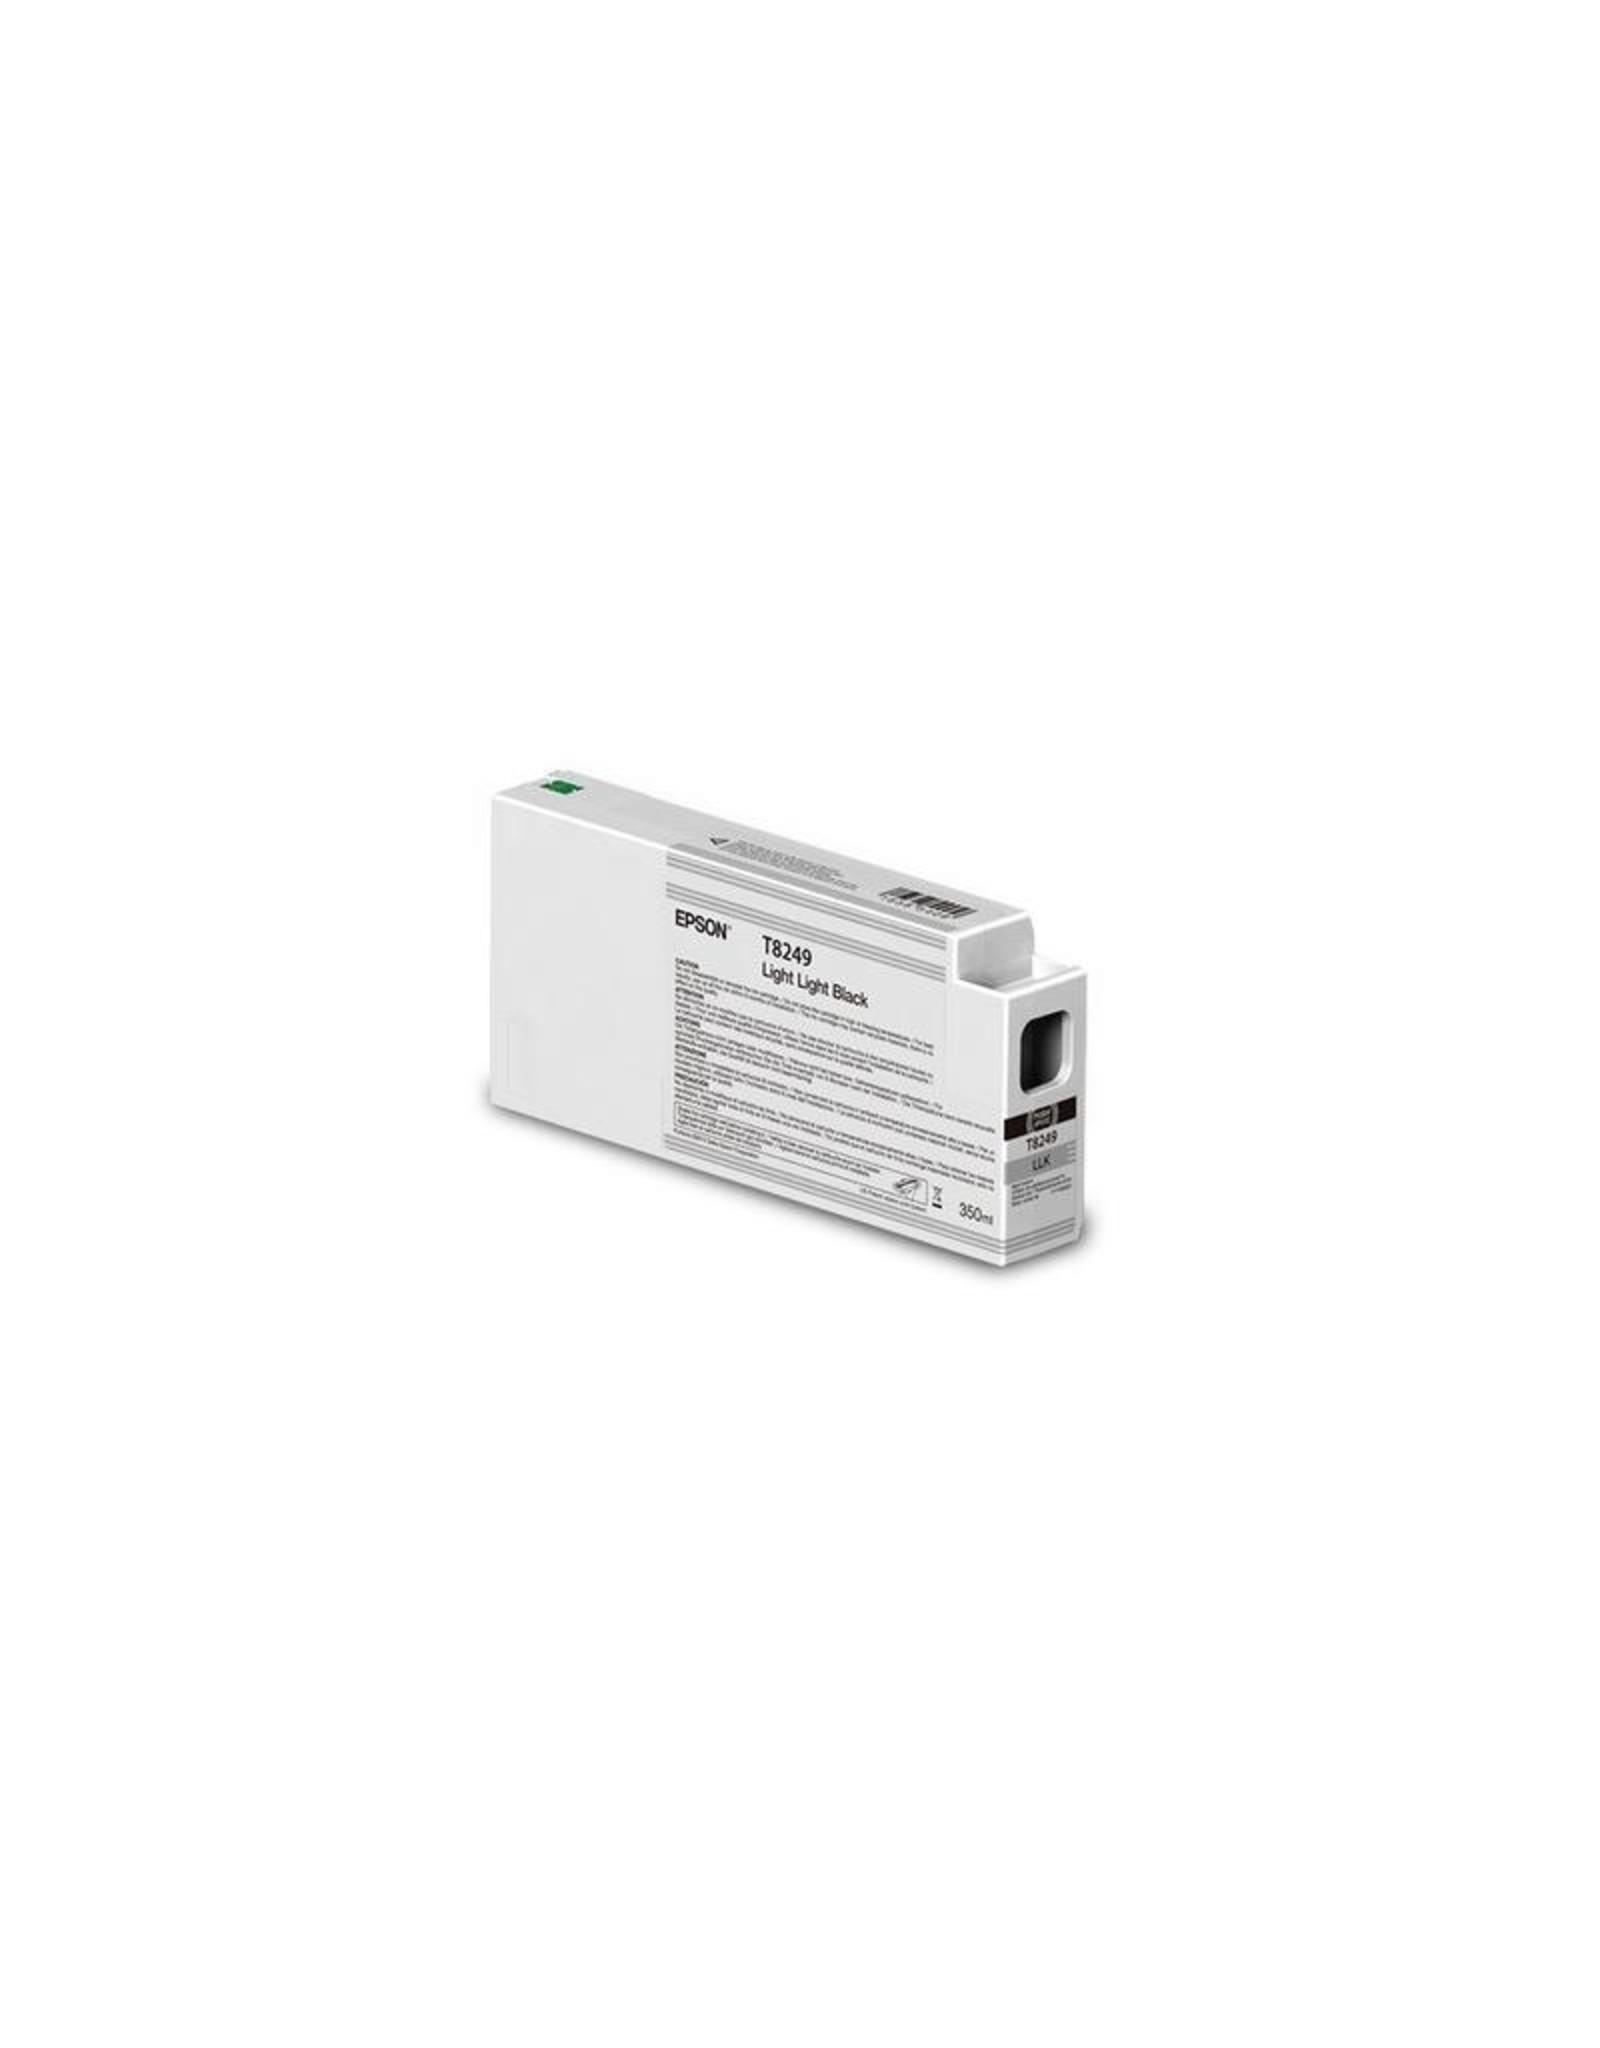 Epson Epson T824900 Ultrachrome HD Light Light BLK Ink 350ML